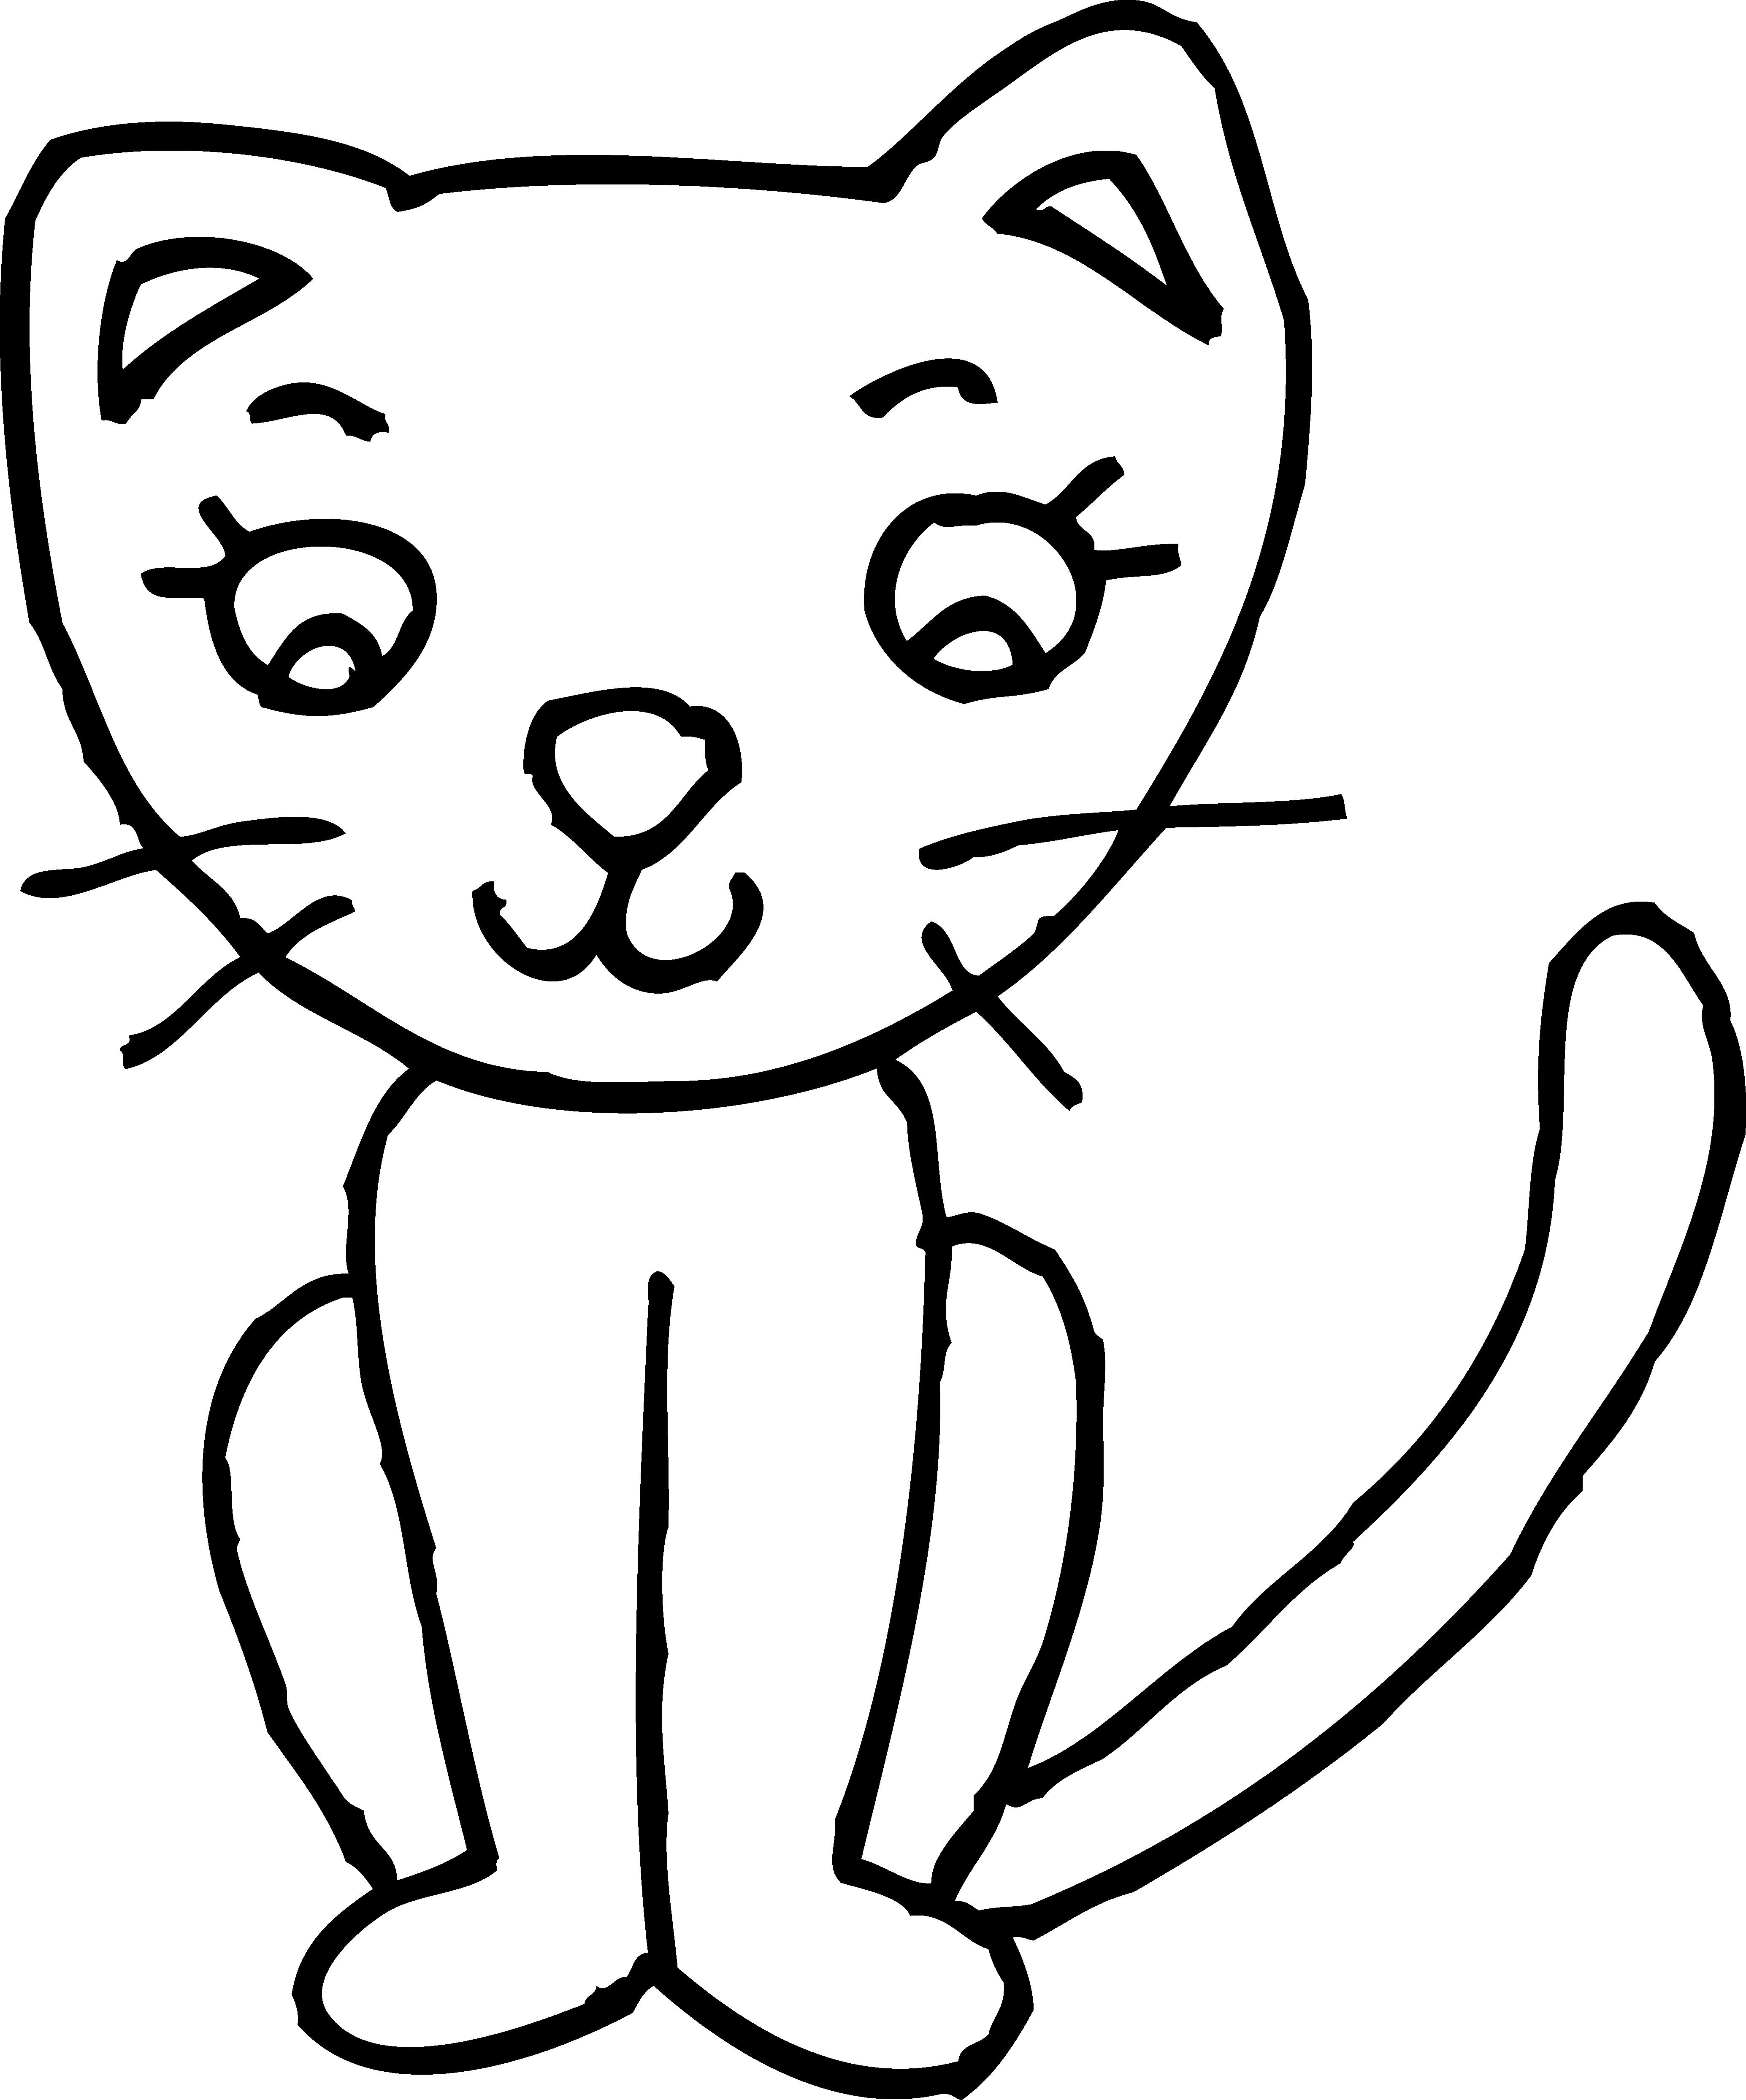 jpg transparent stock Clip art viewing panda. Kittens clipart.